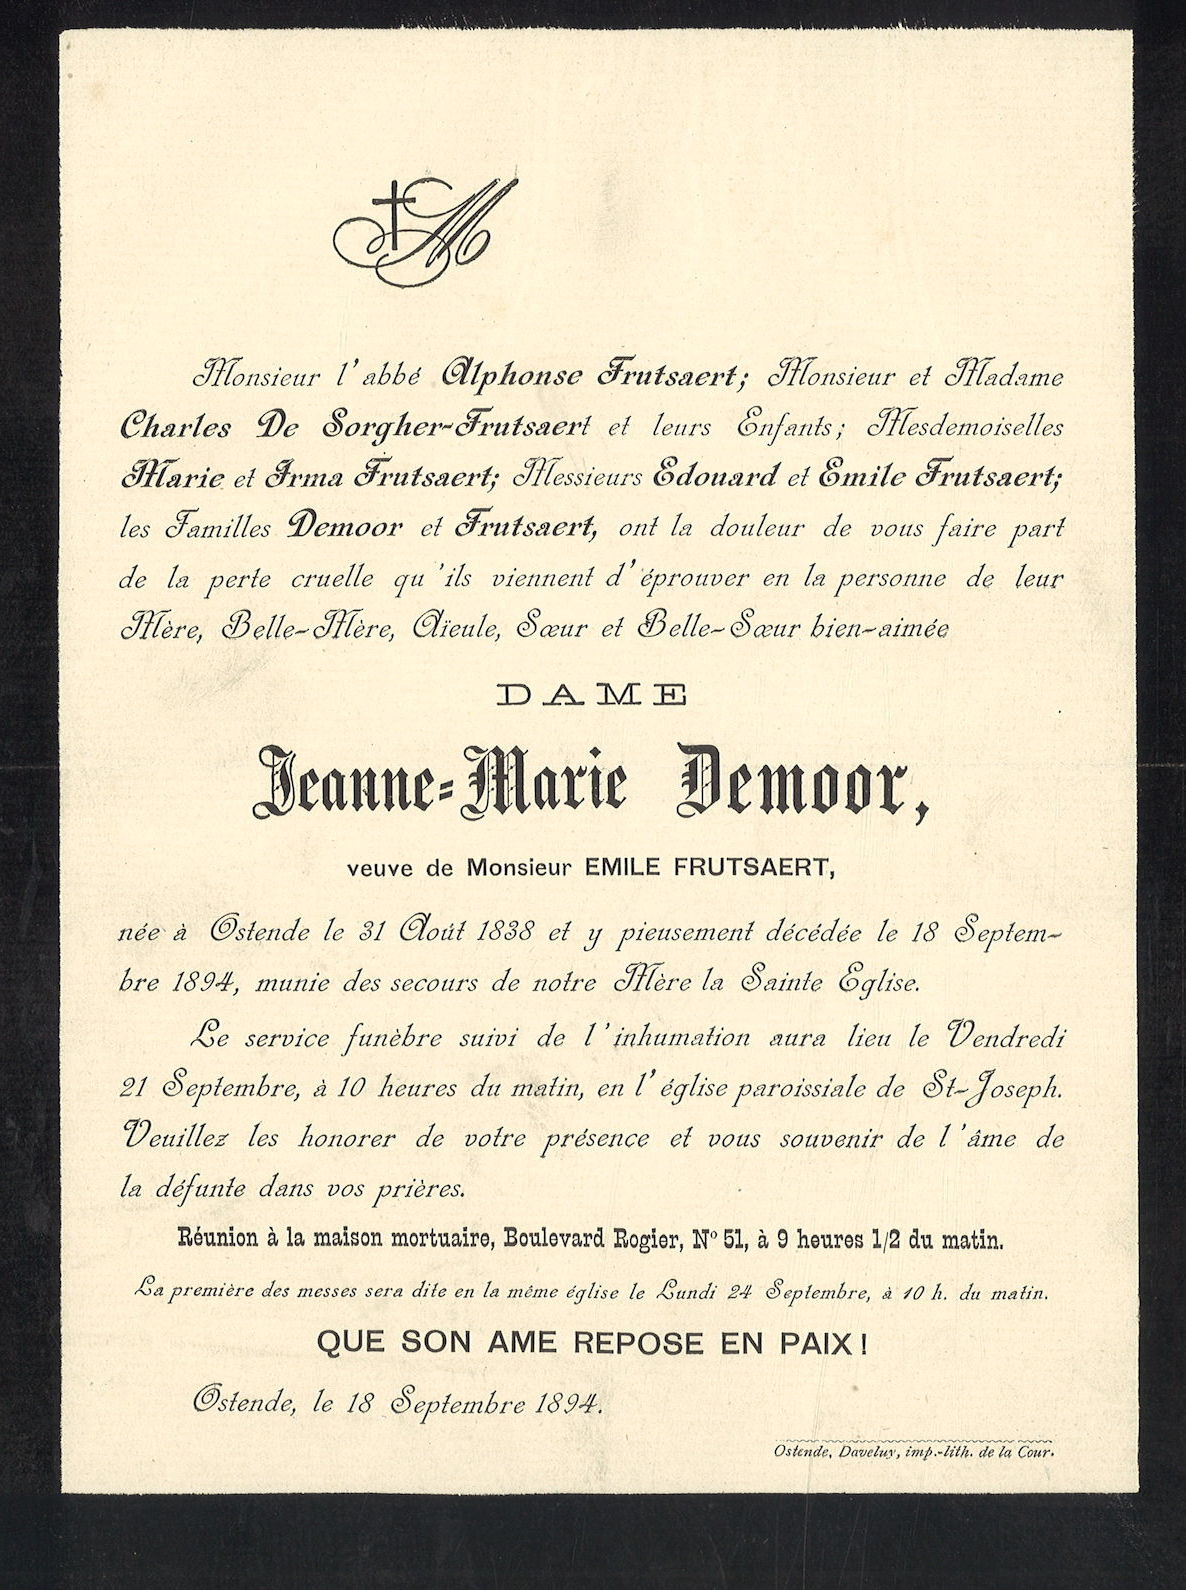 Jeanne-Marie Demoor